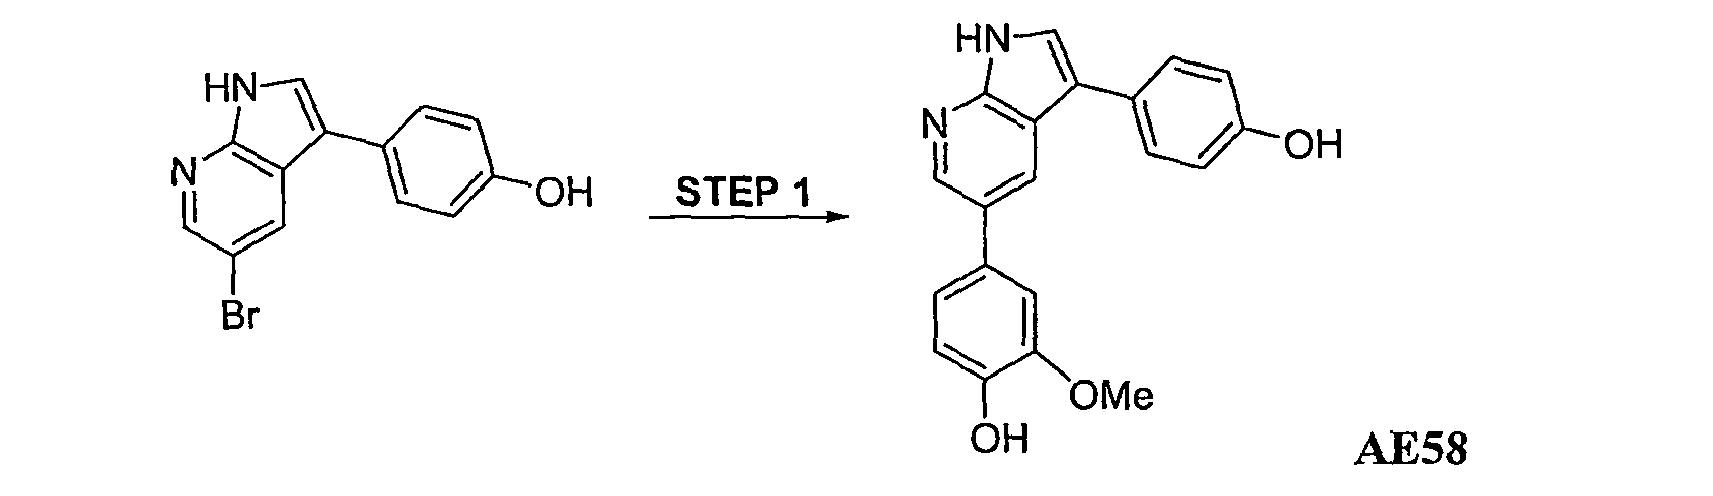 Figure imgb0468